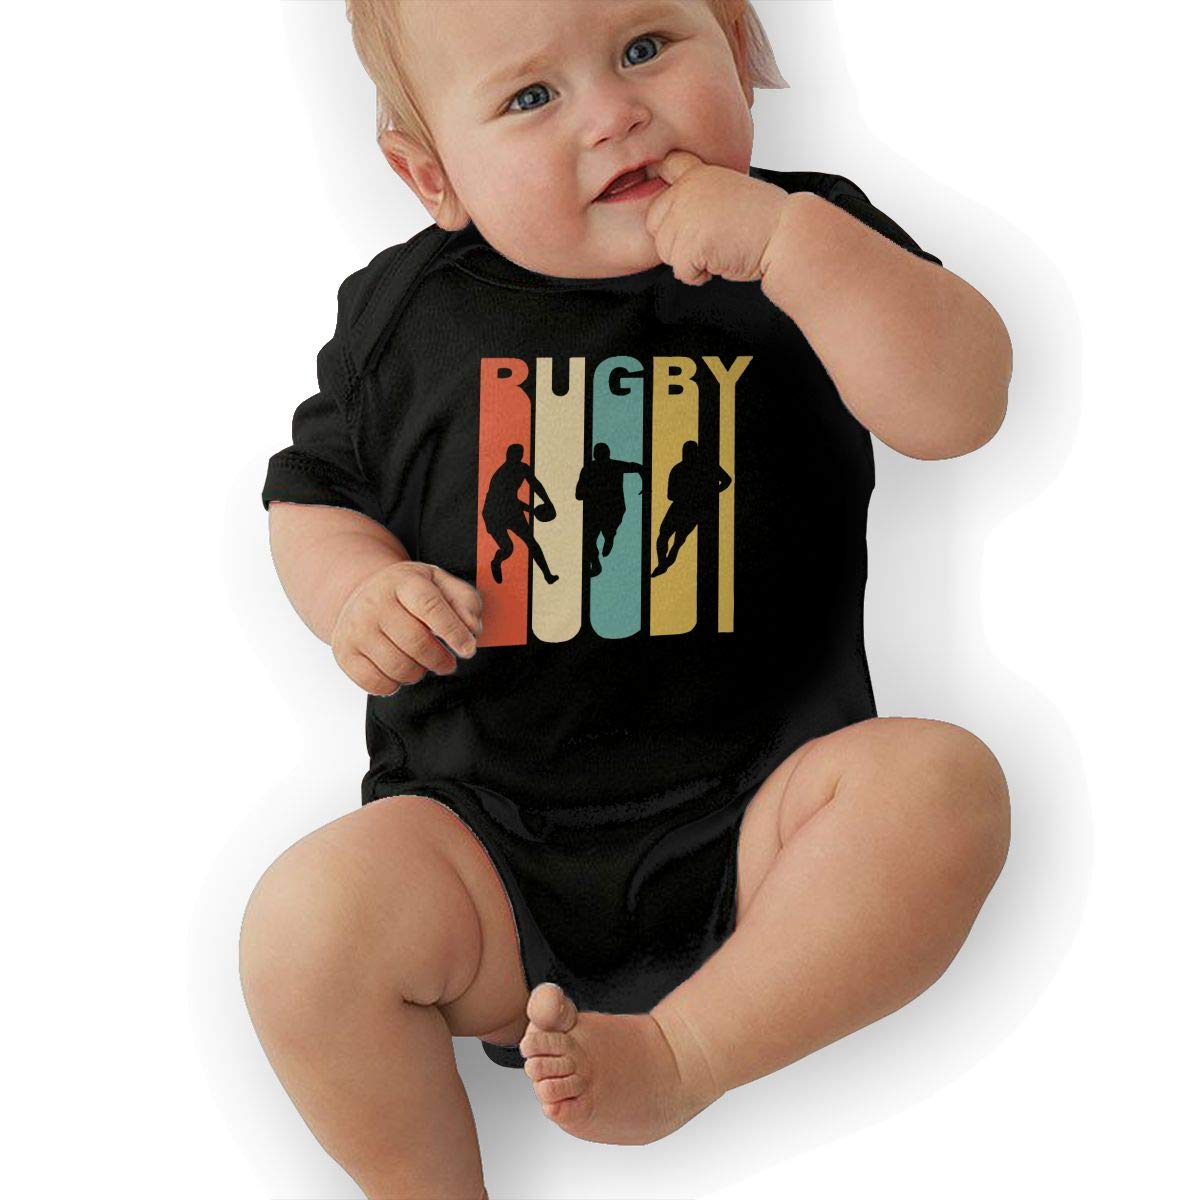 Mri-le2 Toddler Baby Boy Girl Short Sleeve Jersey Bodysuit Retro Rugby Toddler Jumpsuit